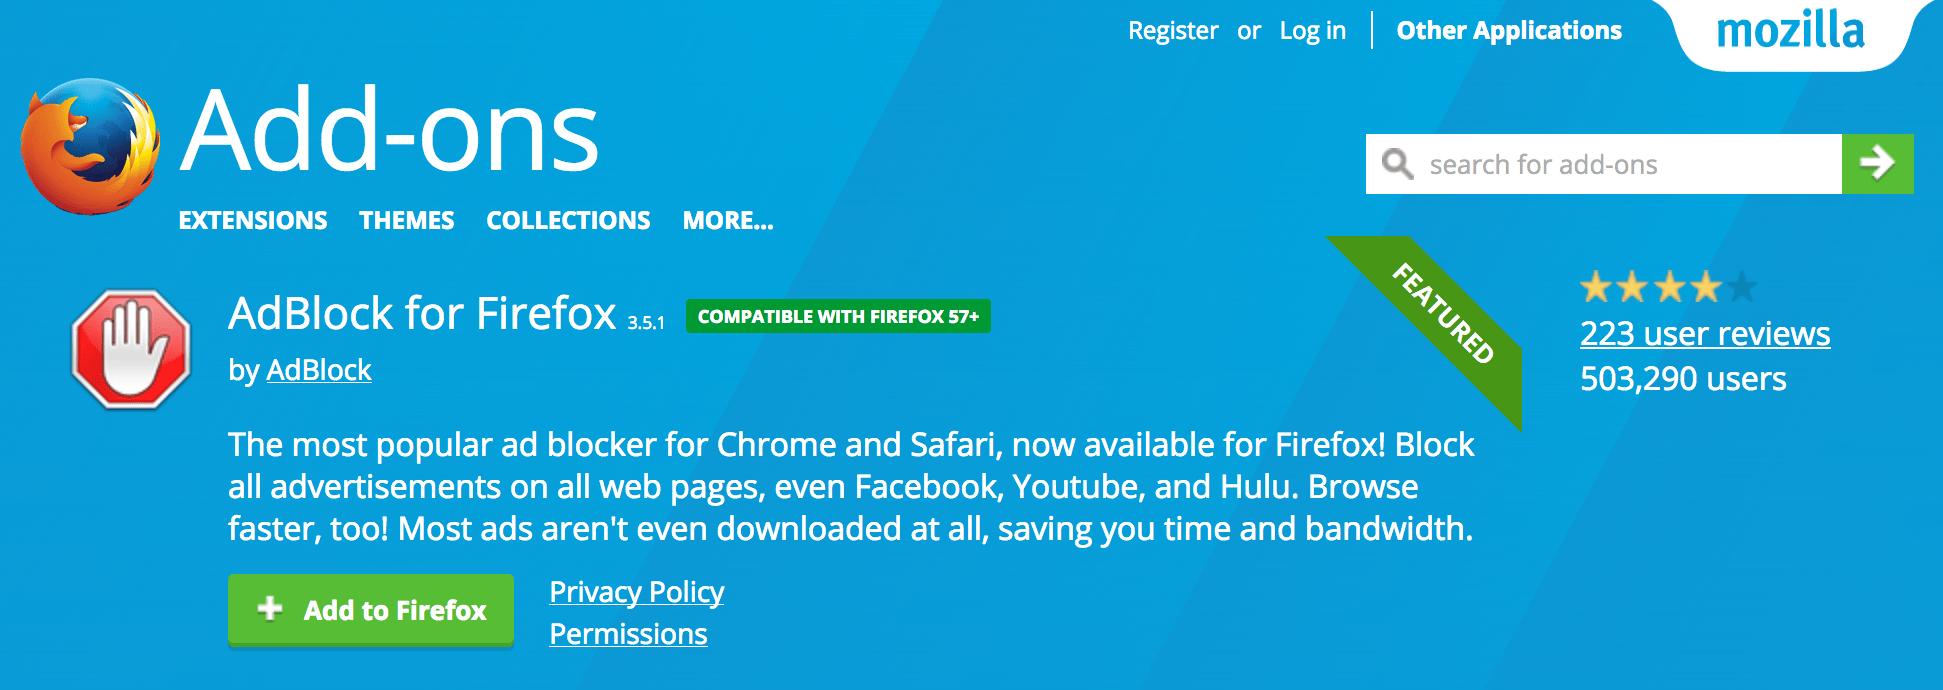 AddBlock for Firefox